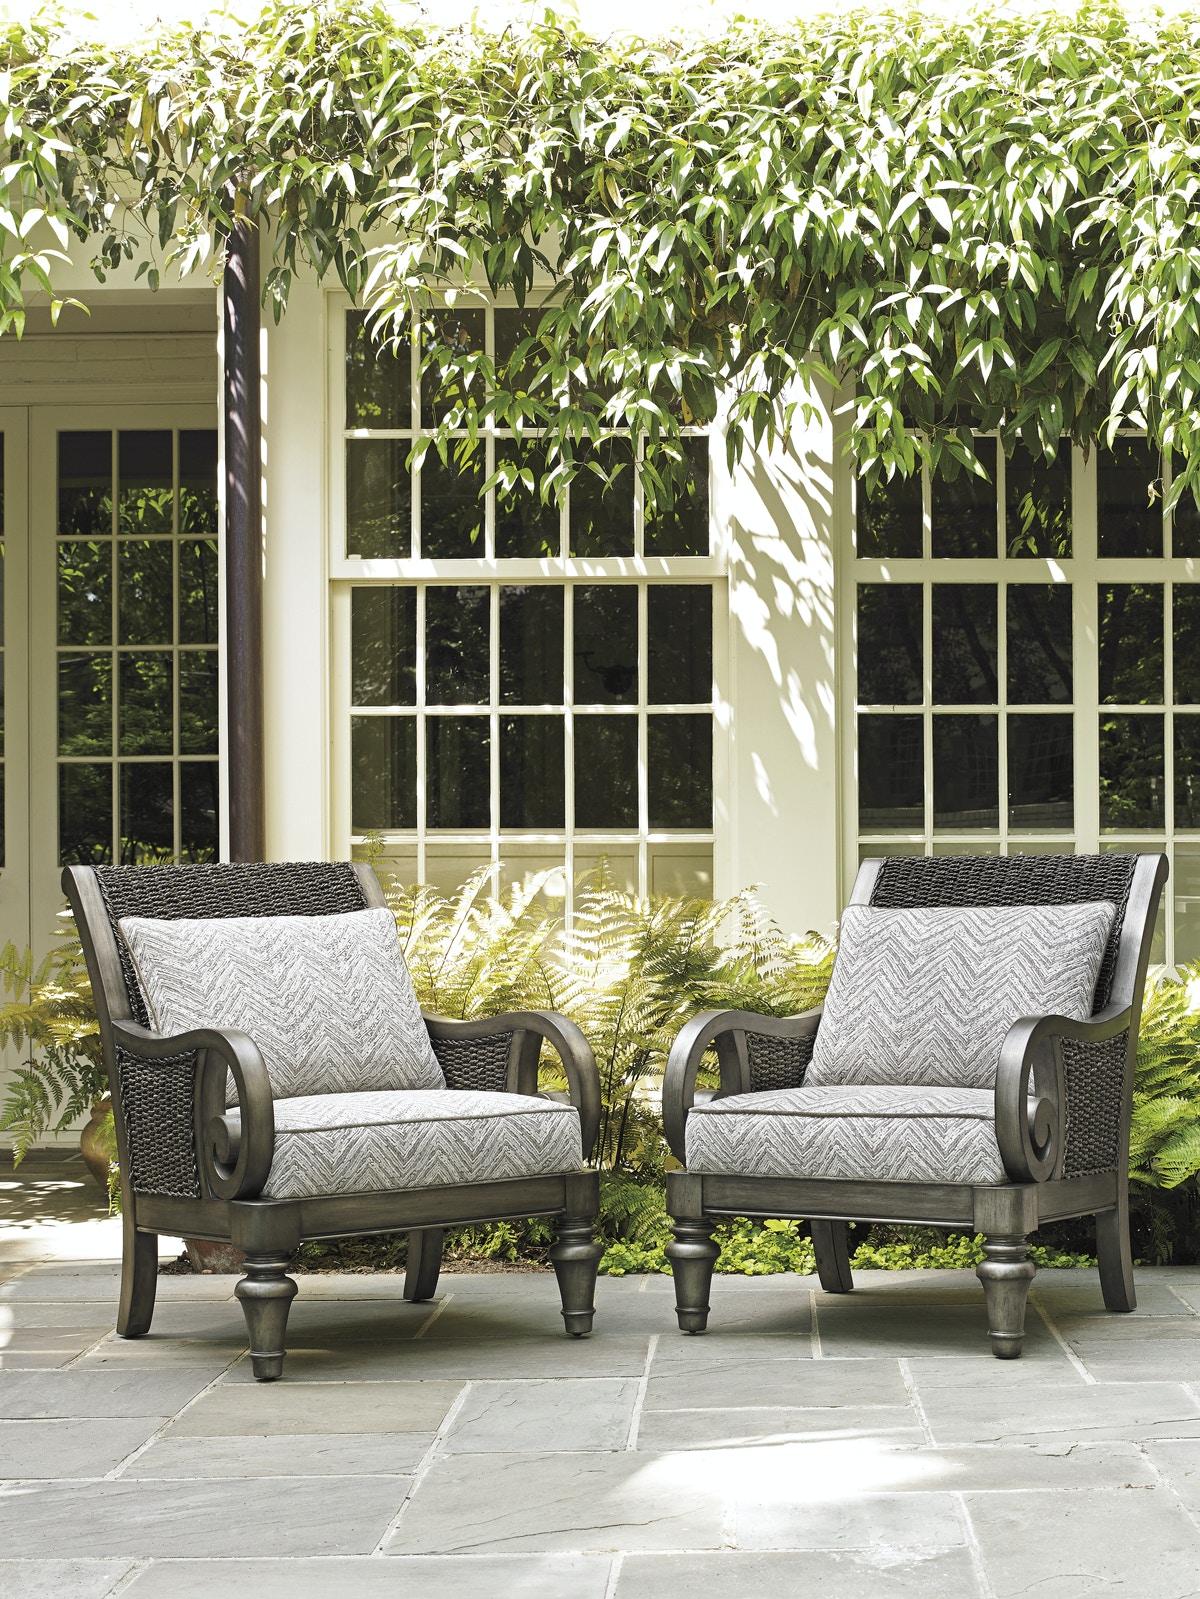 Lexington Furniture Oyster Bay Glen Cove Chair 7704 11